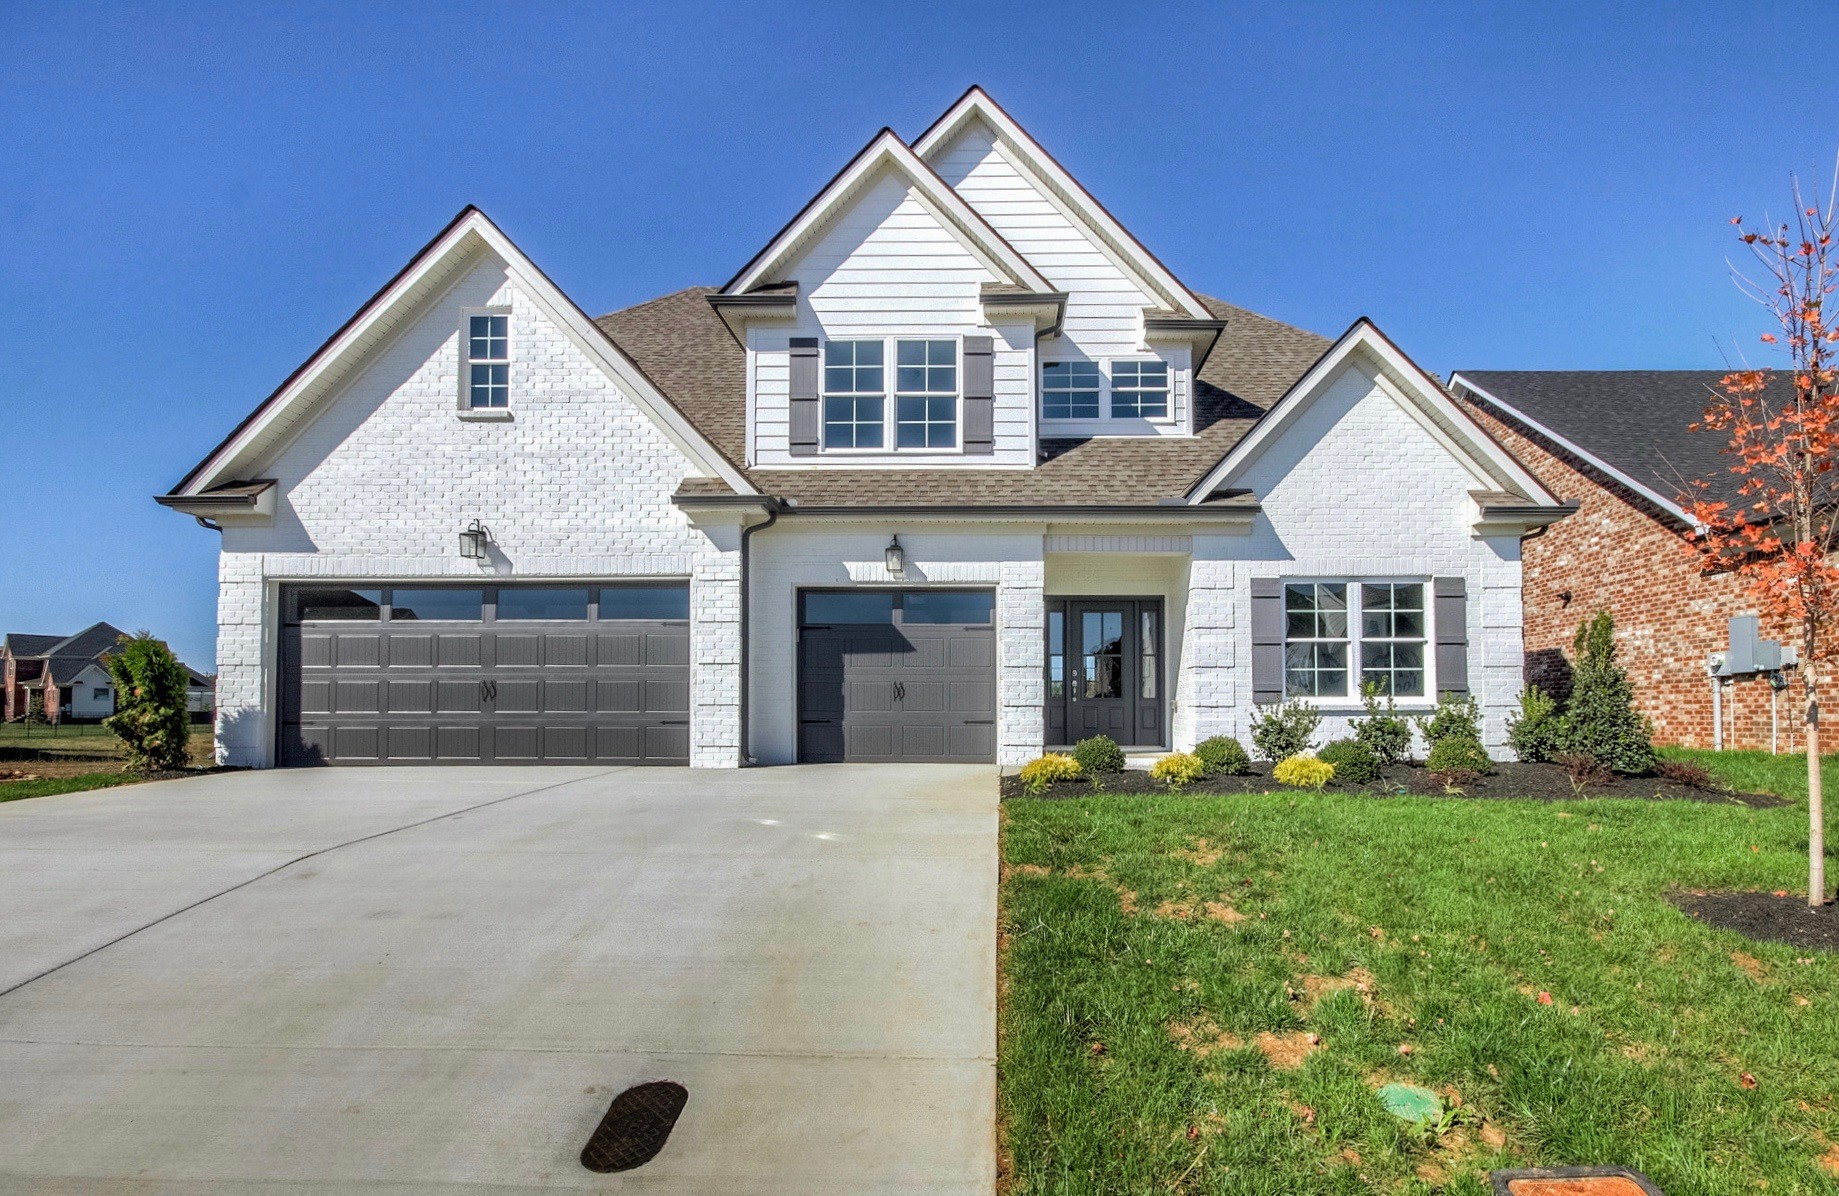 3923 Runyan Cove (Lot 20), Murfreesboro, TN 37127 - Murfreesboro, TN real estate listing